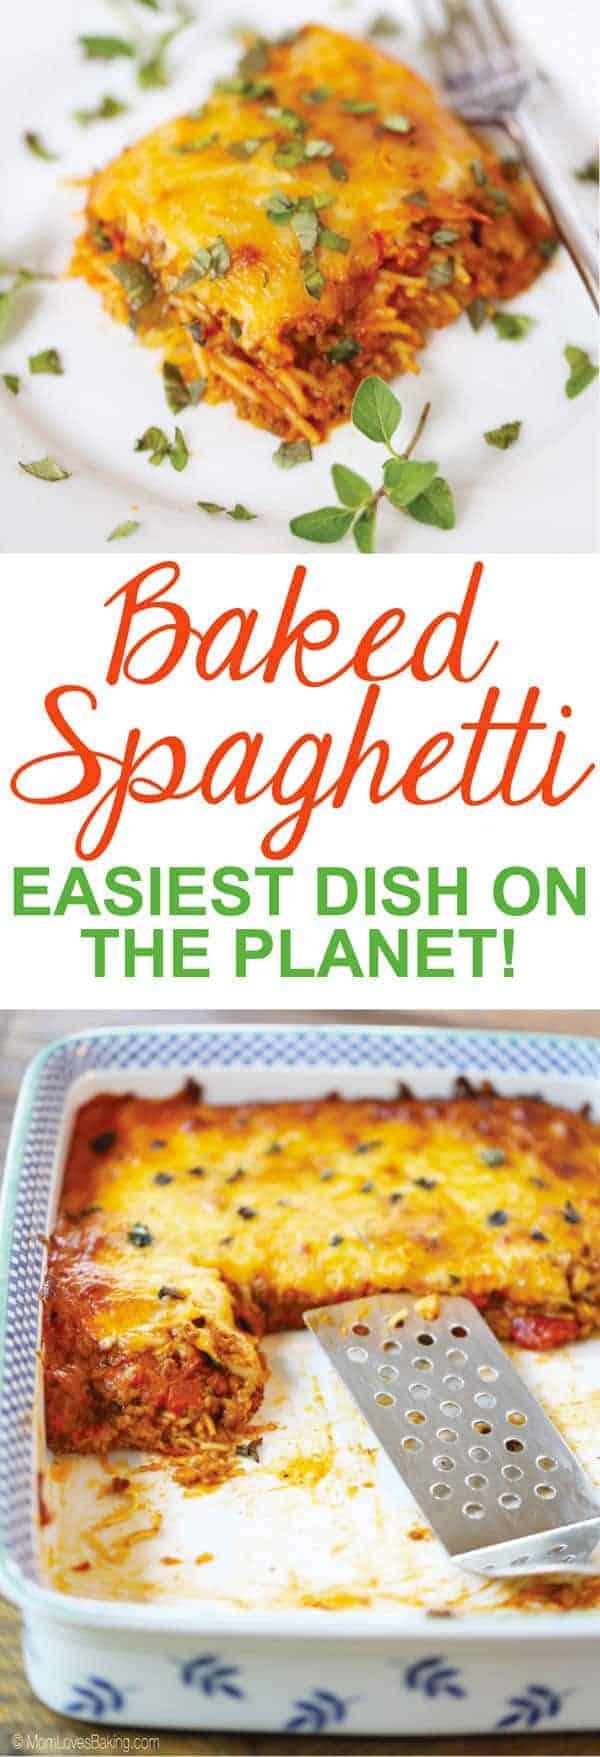 Baked Spaghetti Casserole Dish